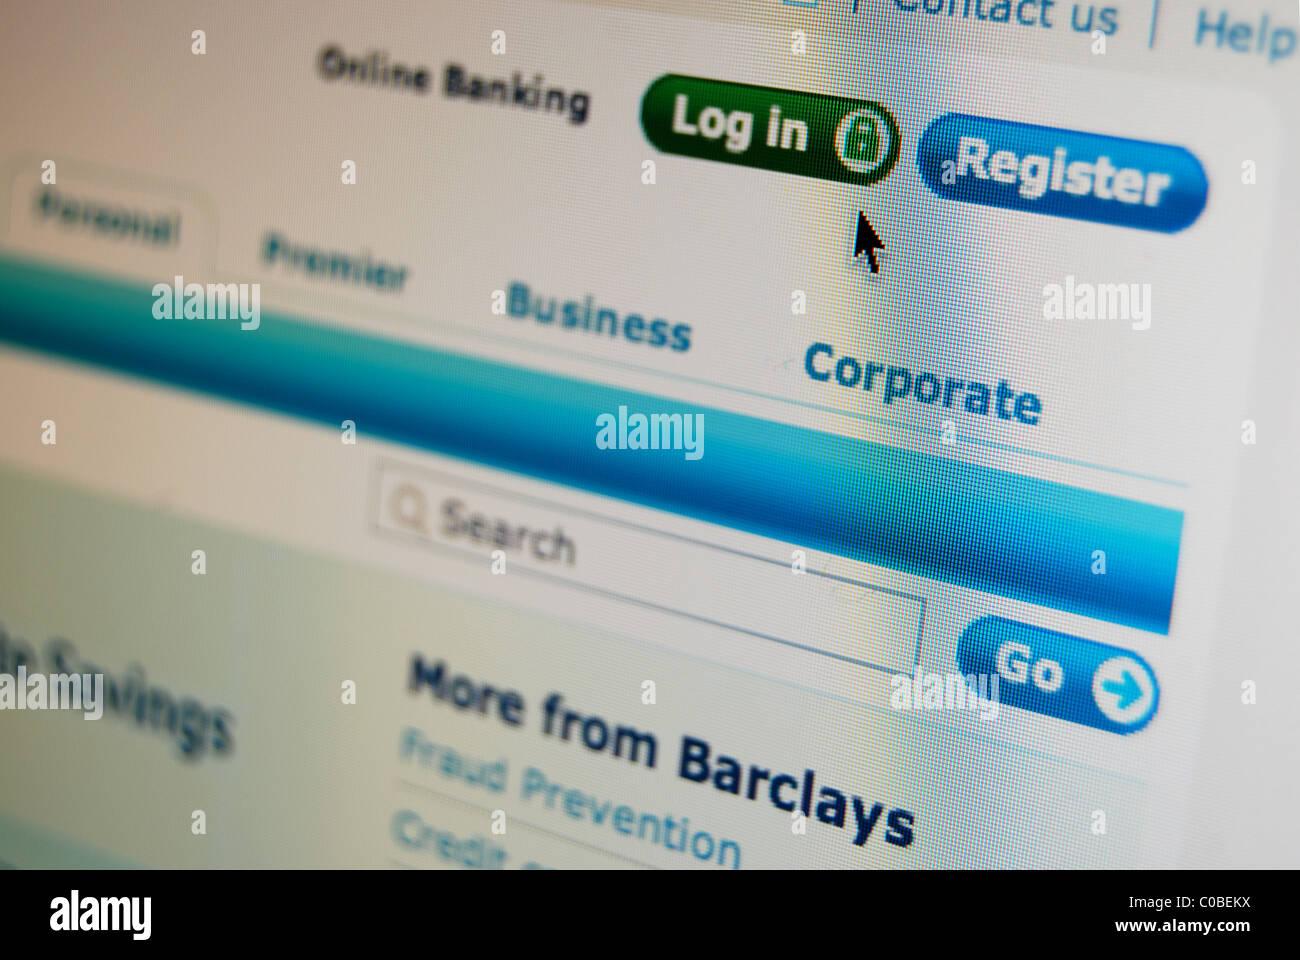 Barclays bank website internet stock photos barclays bank website a photo illustration of the barclays bank website stock image reheart Images